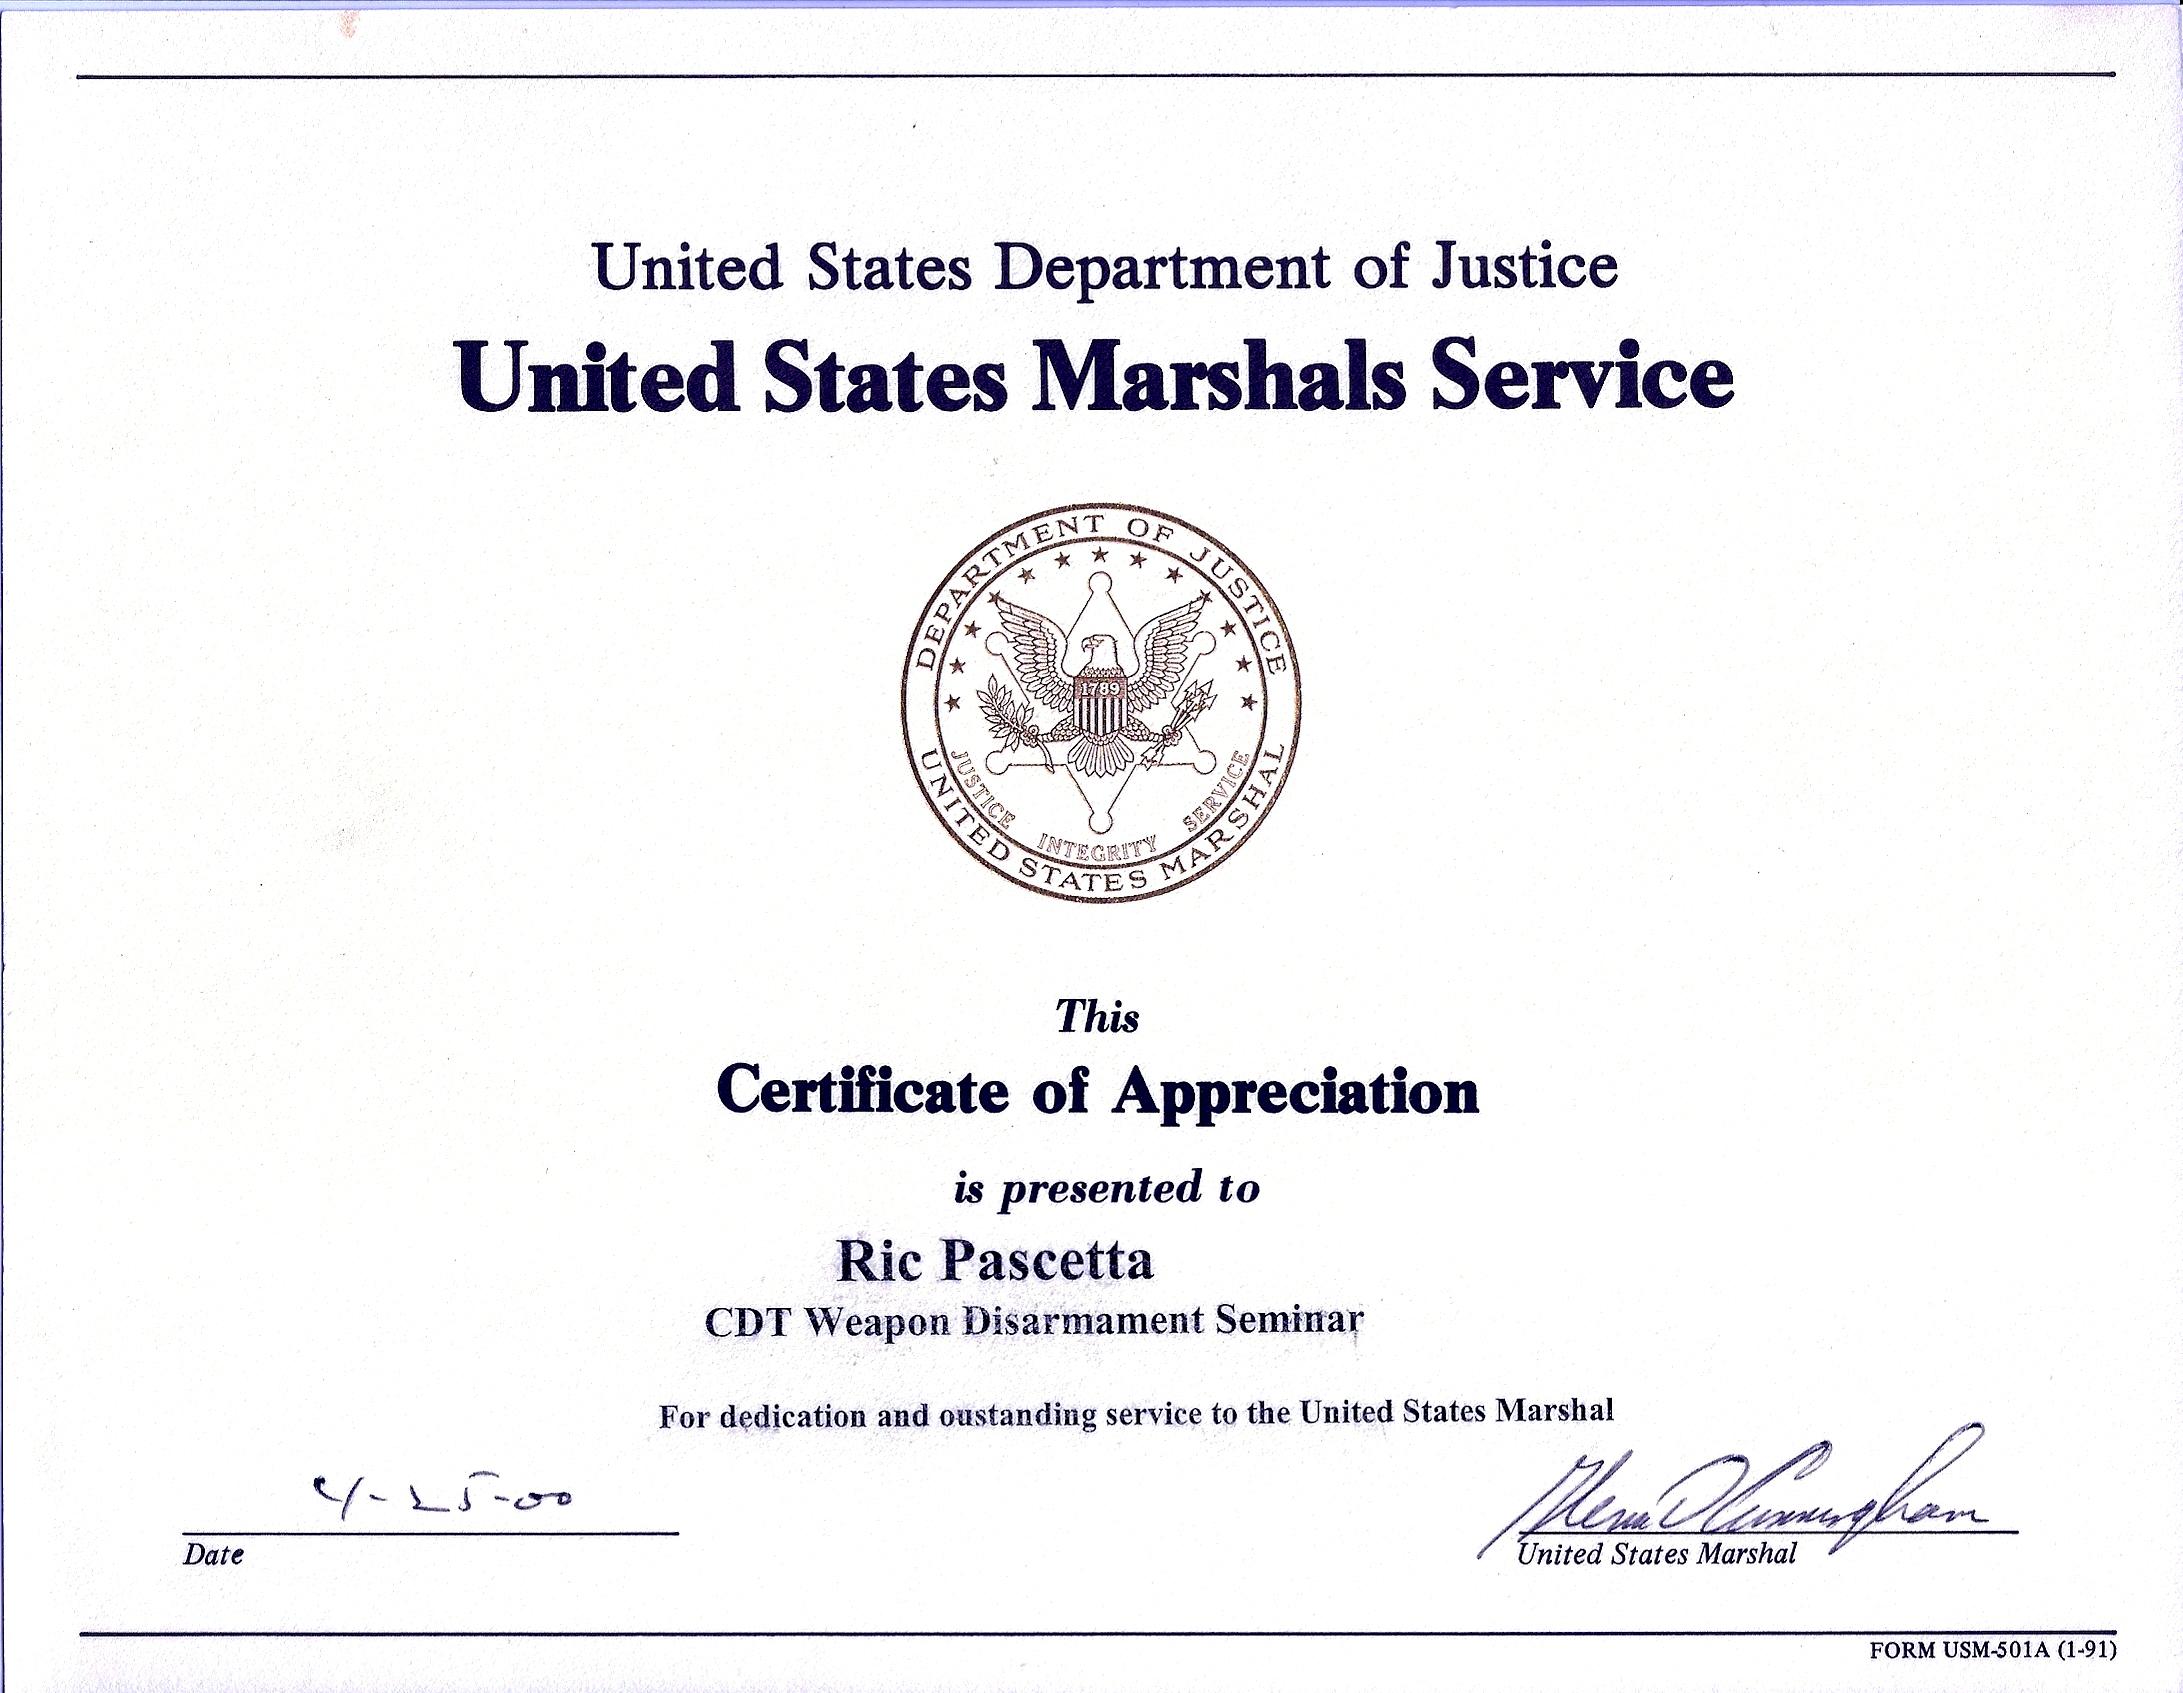 marshall rosenbluth thesis award Authorized by karl krushelnick, secretary/treasurer of dpp ===== dpp e-news ~ january 2012 ===== inside this issue: 1 landau marshall rosenbluth thesis award (dissertation prize) the closing date for receipt of nominations is april 2, 2012.